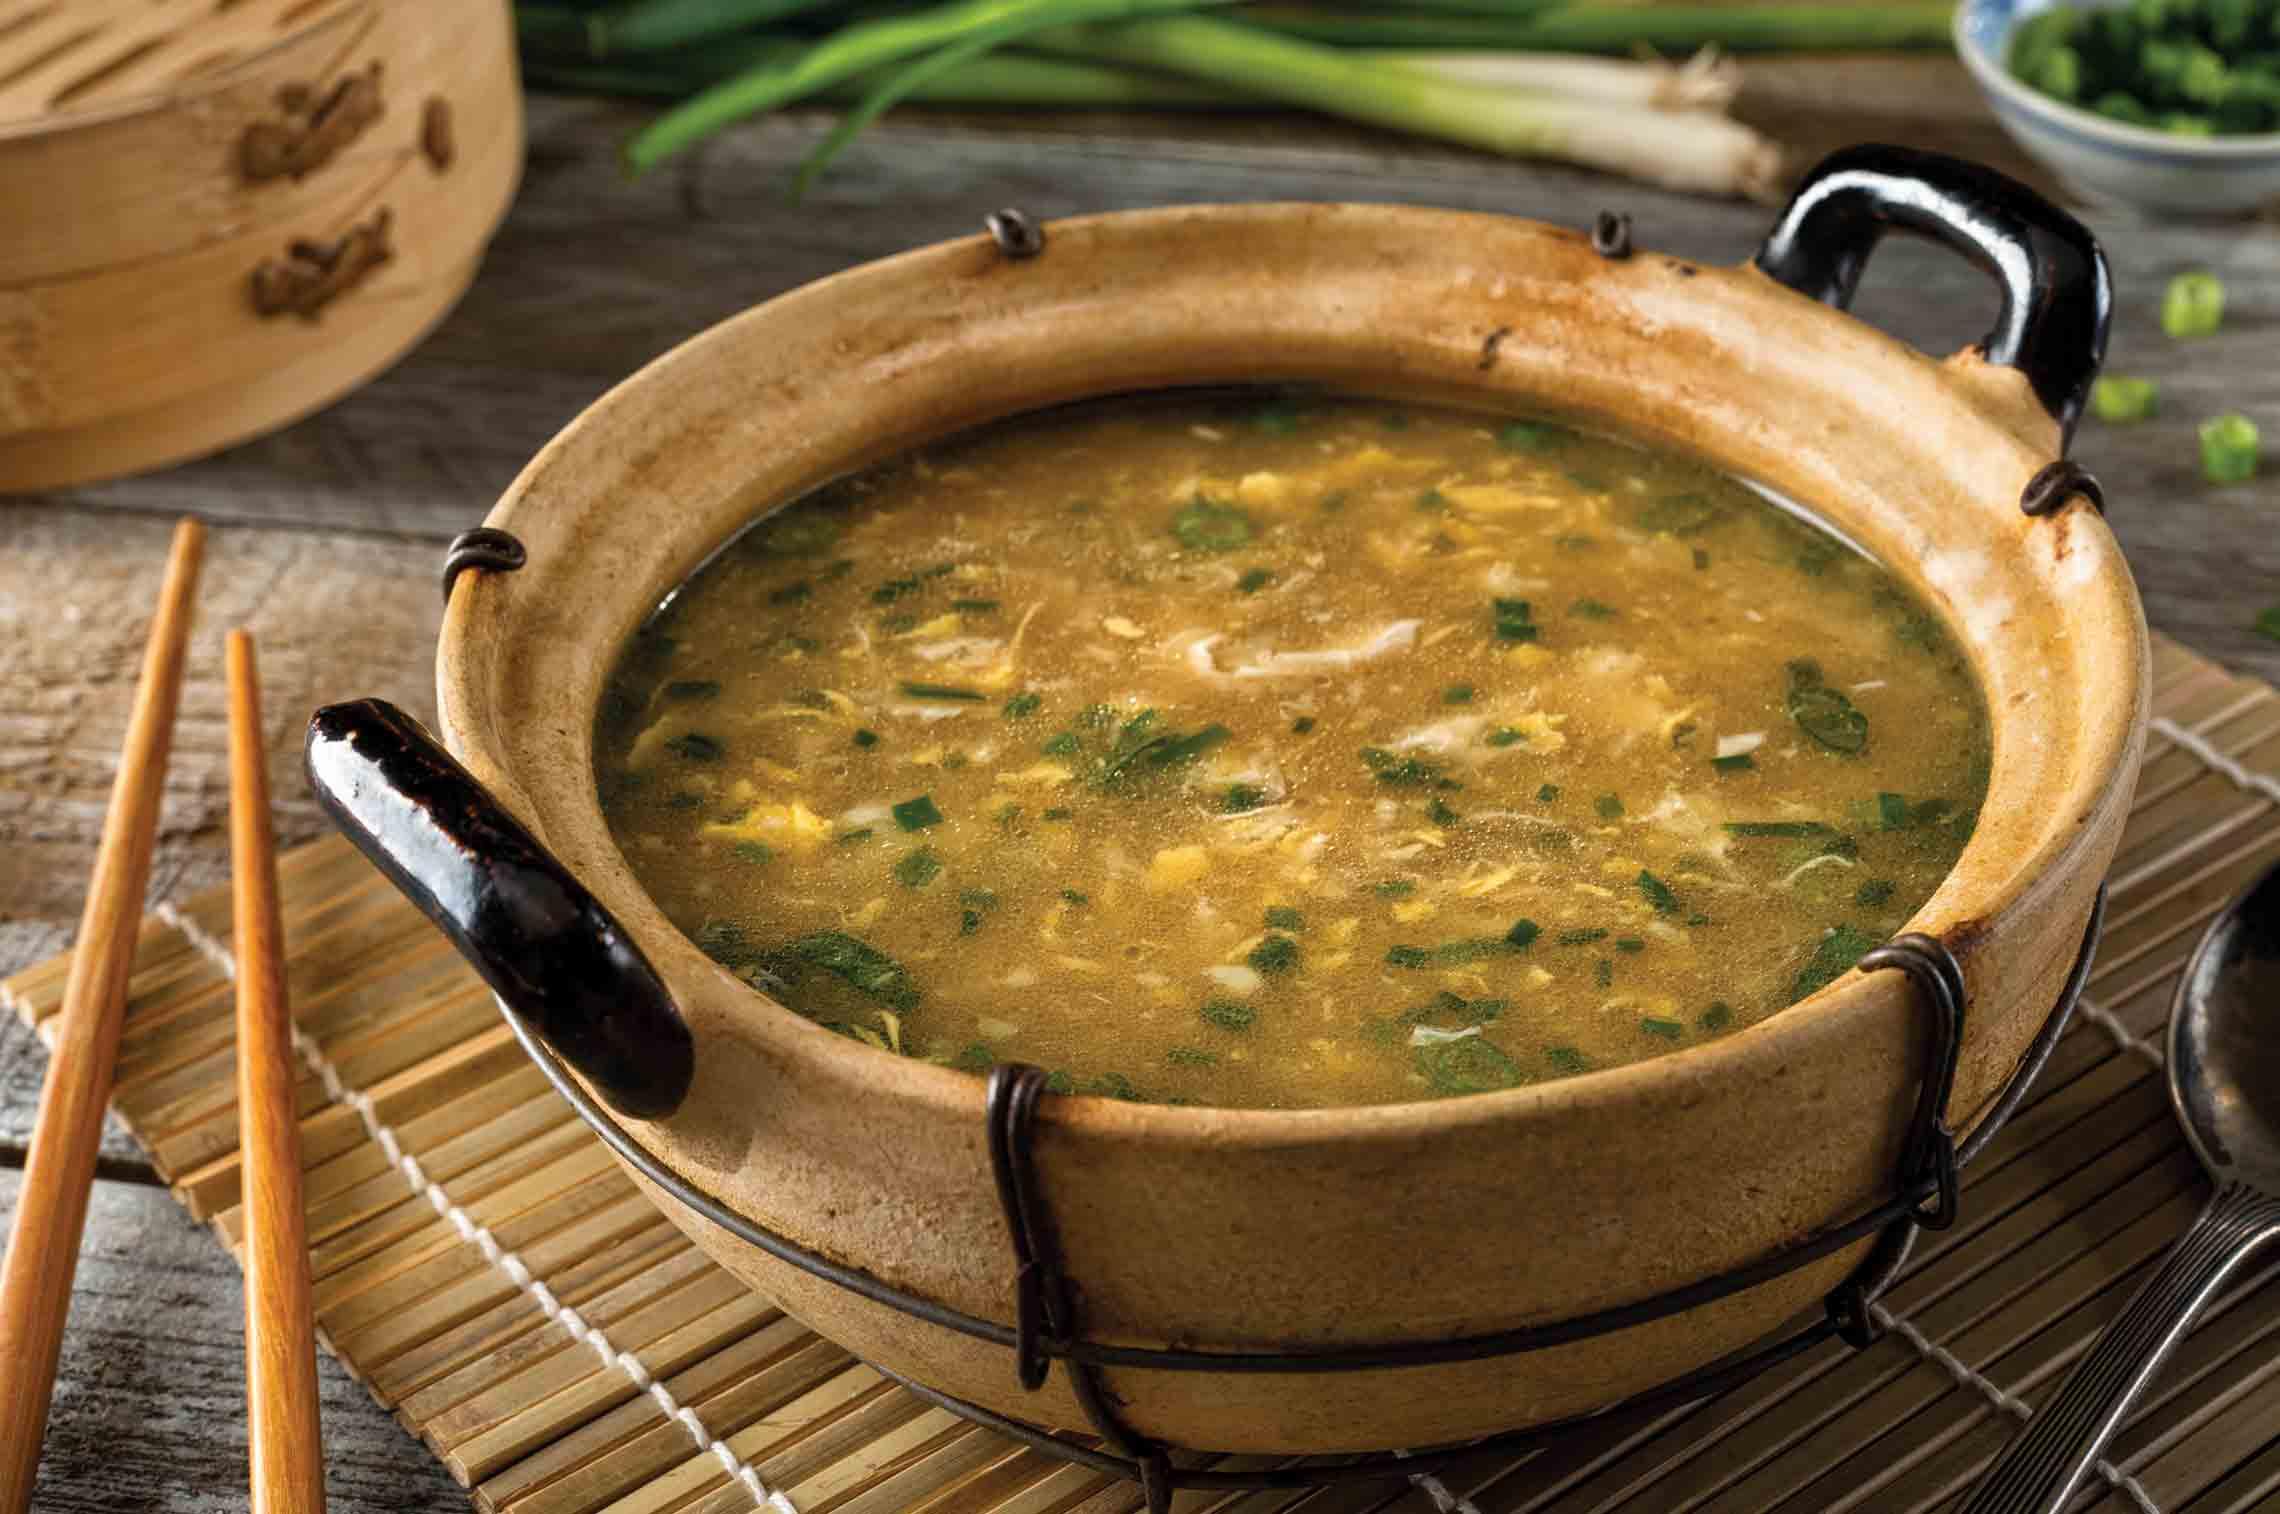 A Delicious Soup Recipe Featuring Spring Veggies